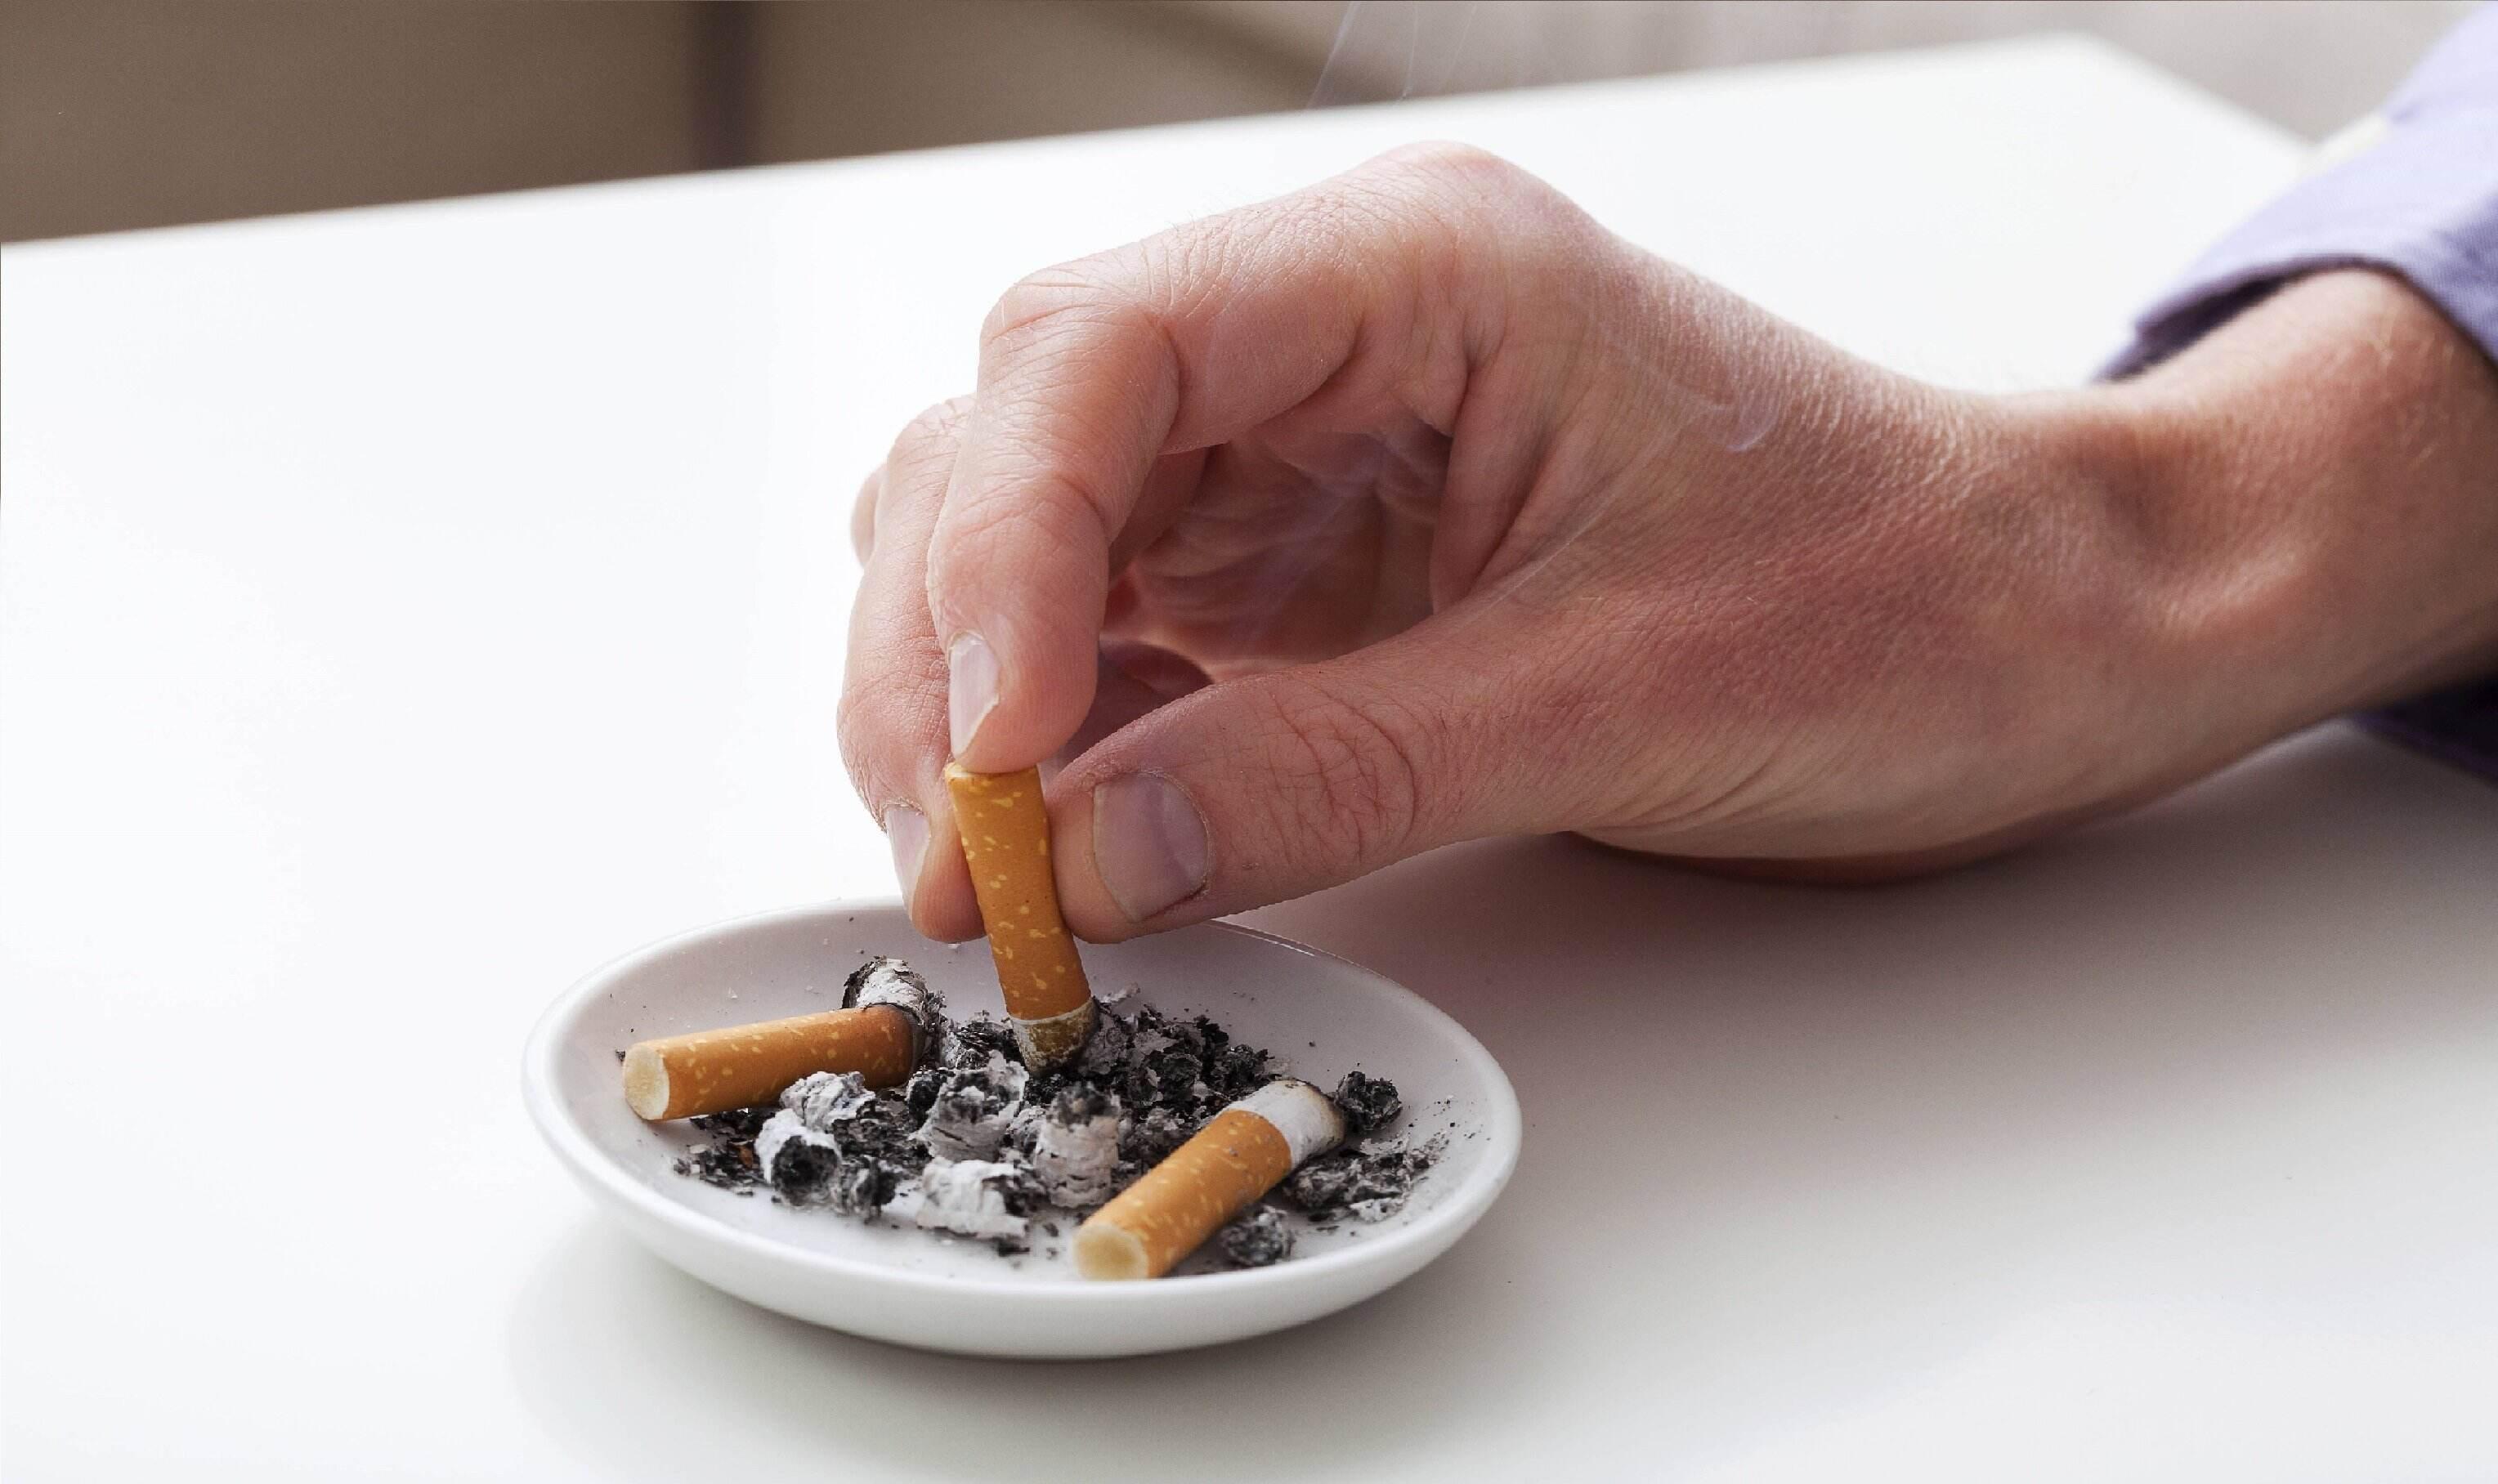 Smoke cigarettes learning to women I am